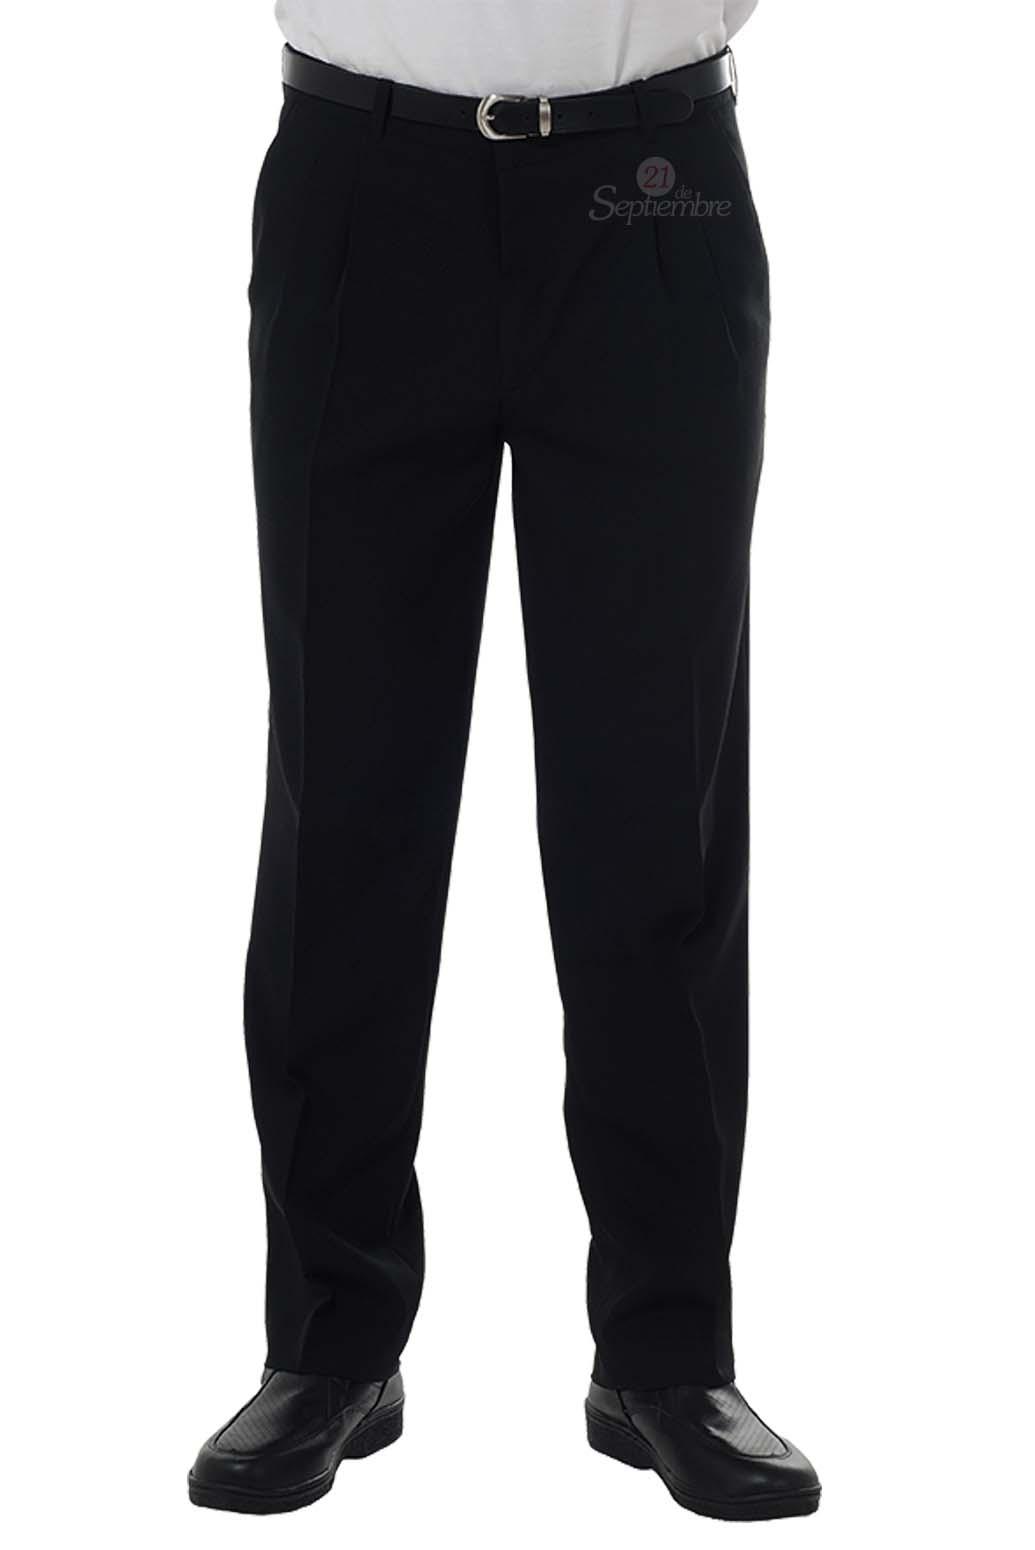 Pantalón de Vestir Hombre - 21 de Septiembre